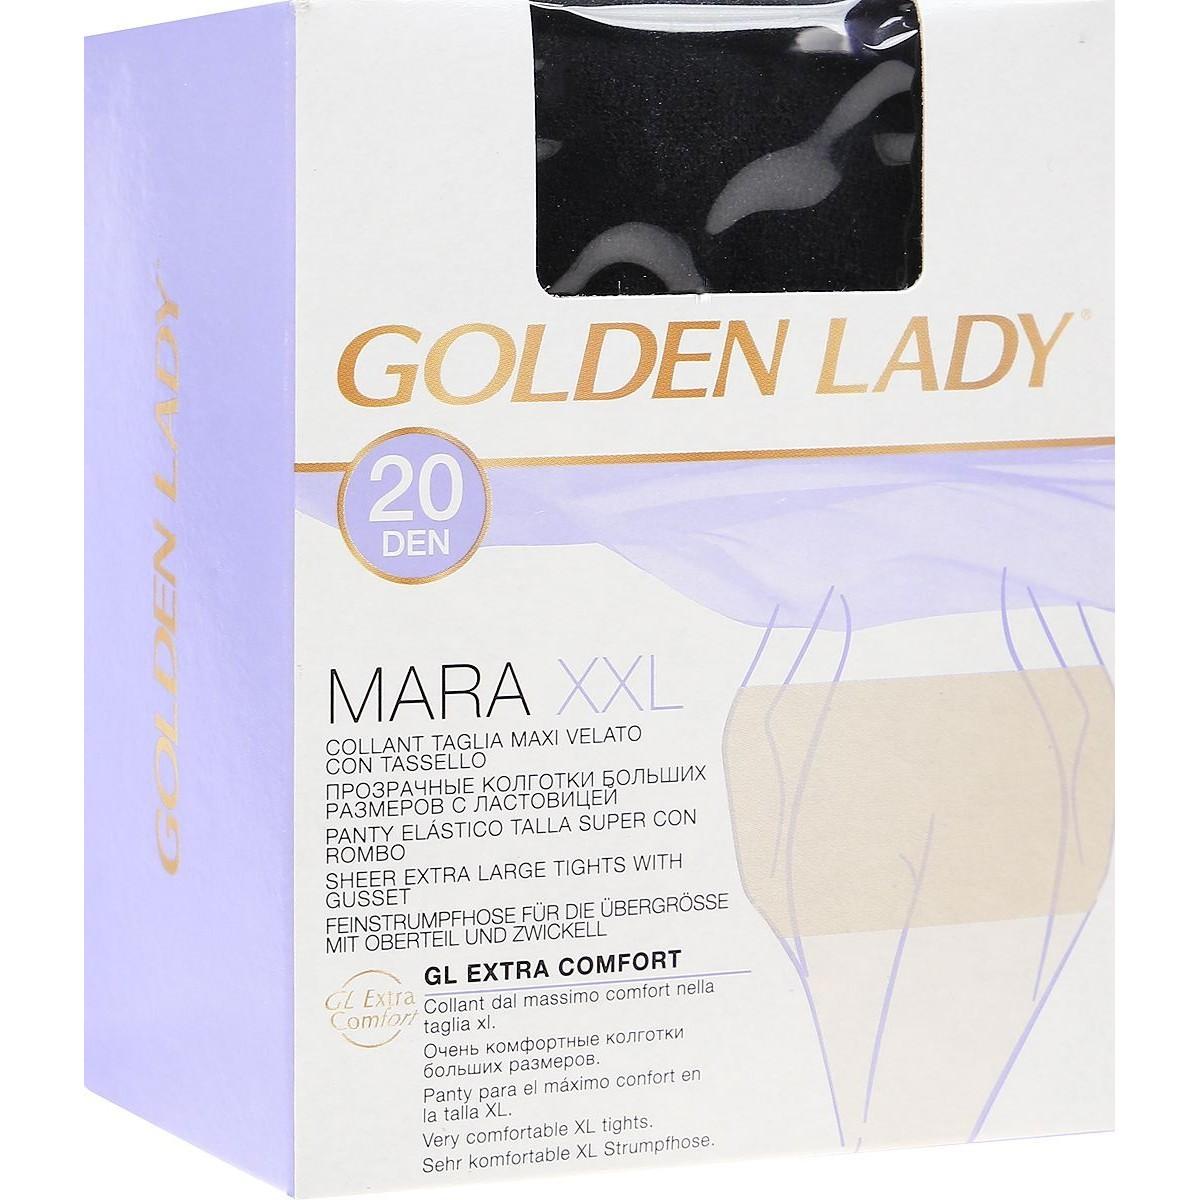 Колготки, чулки, носки Колготки GOLDEN LADY MARA 20 den matovye_kolgotki_golden_lady_mara_20_xxl_284-1200x1200h.jpg